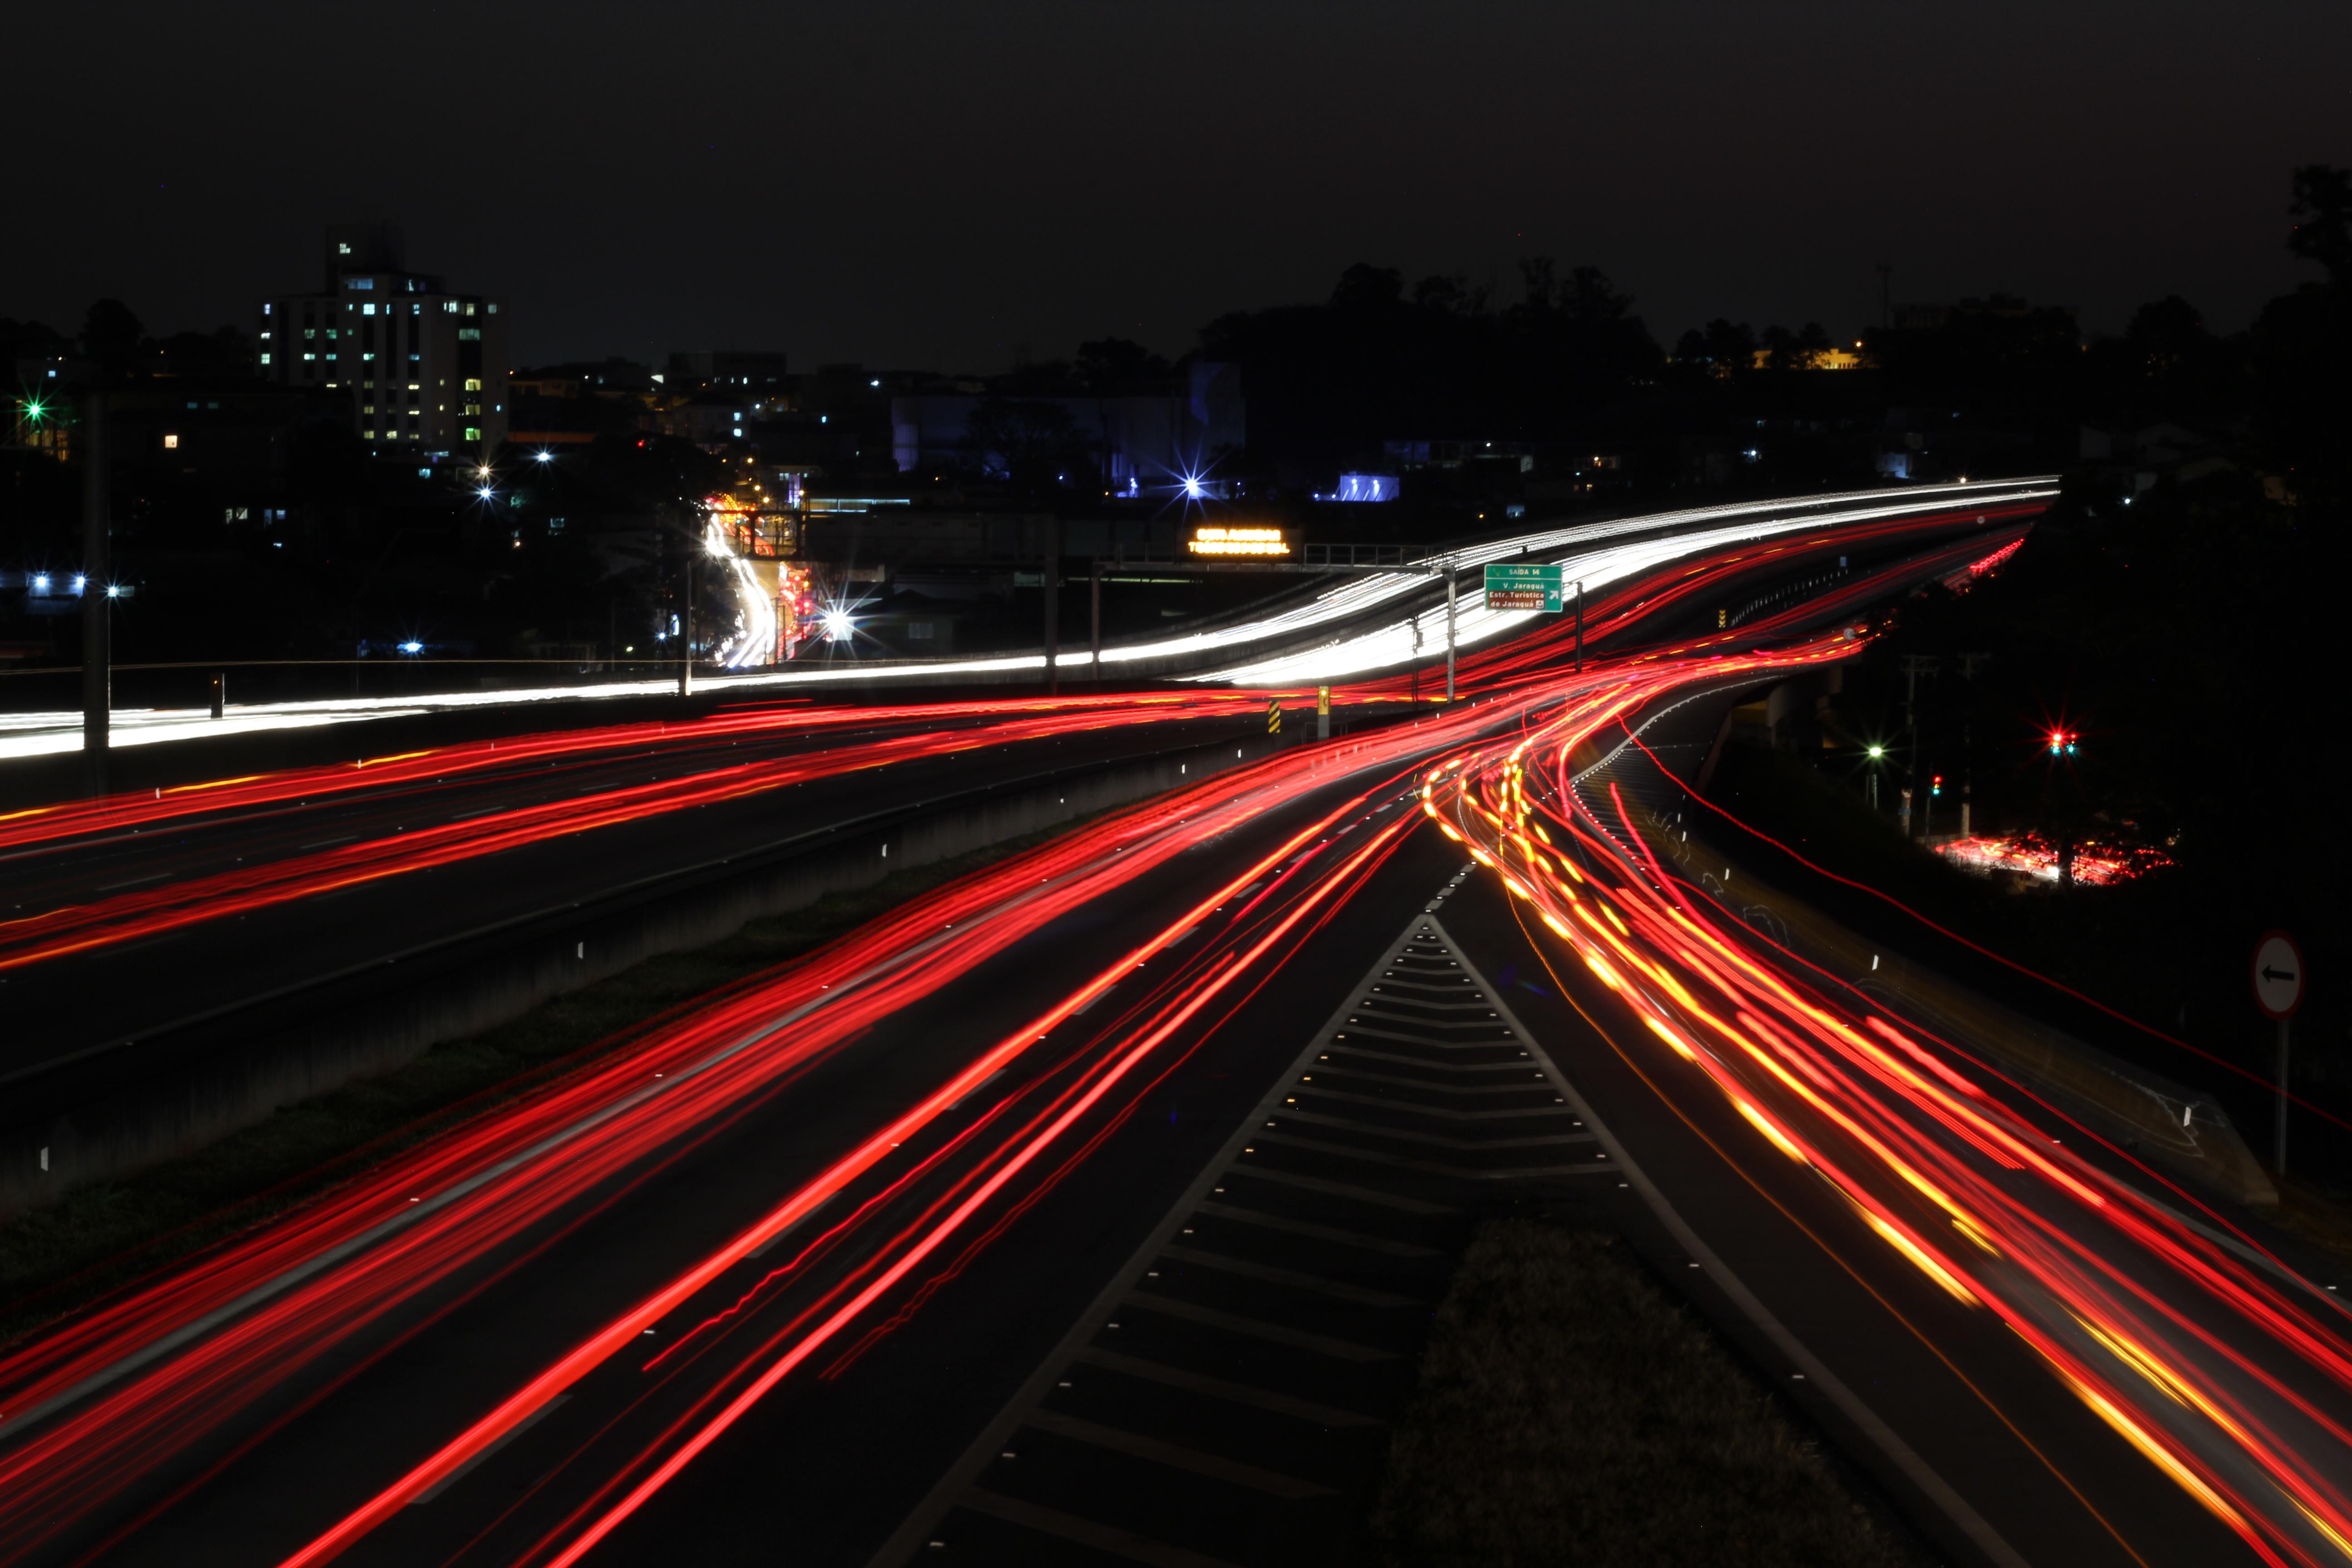 Free stock photo of city, road, traffic, vehicles